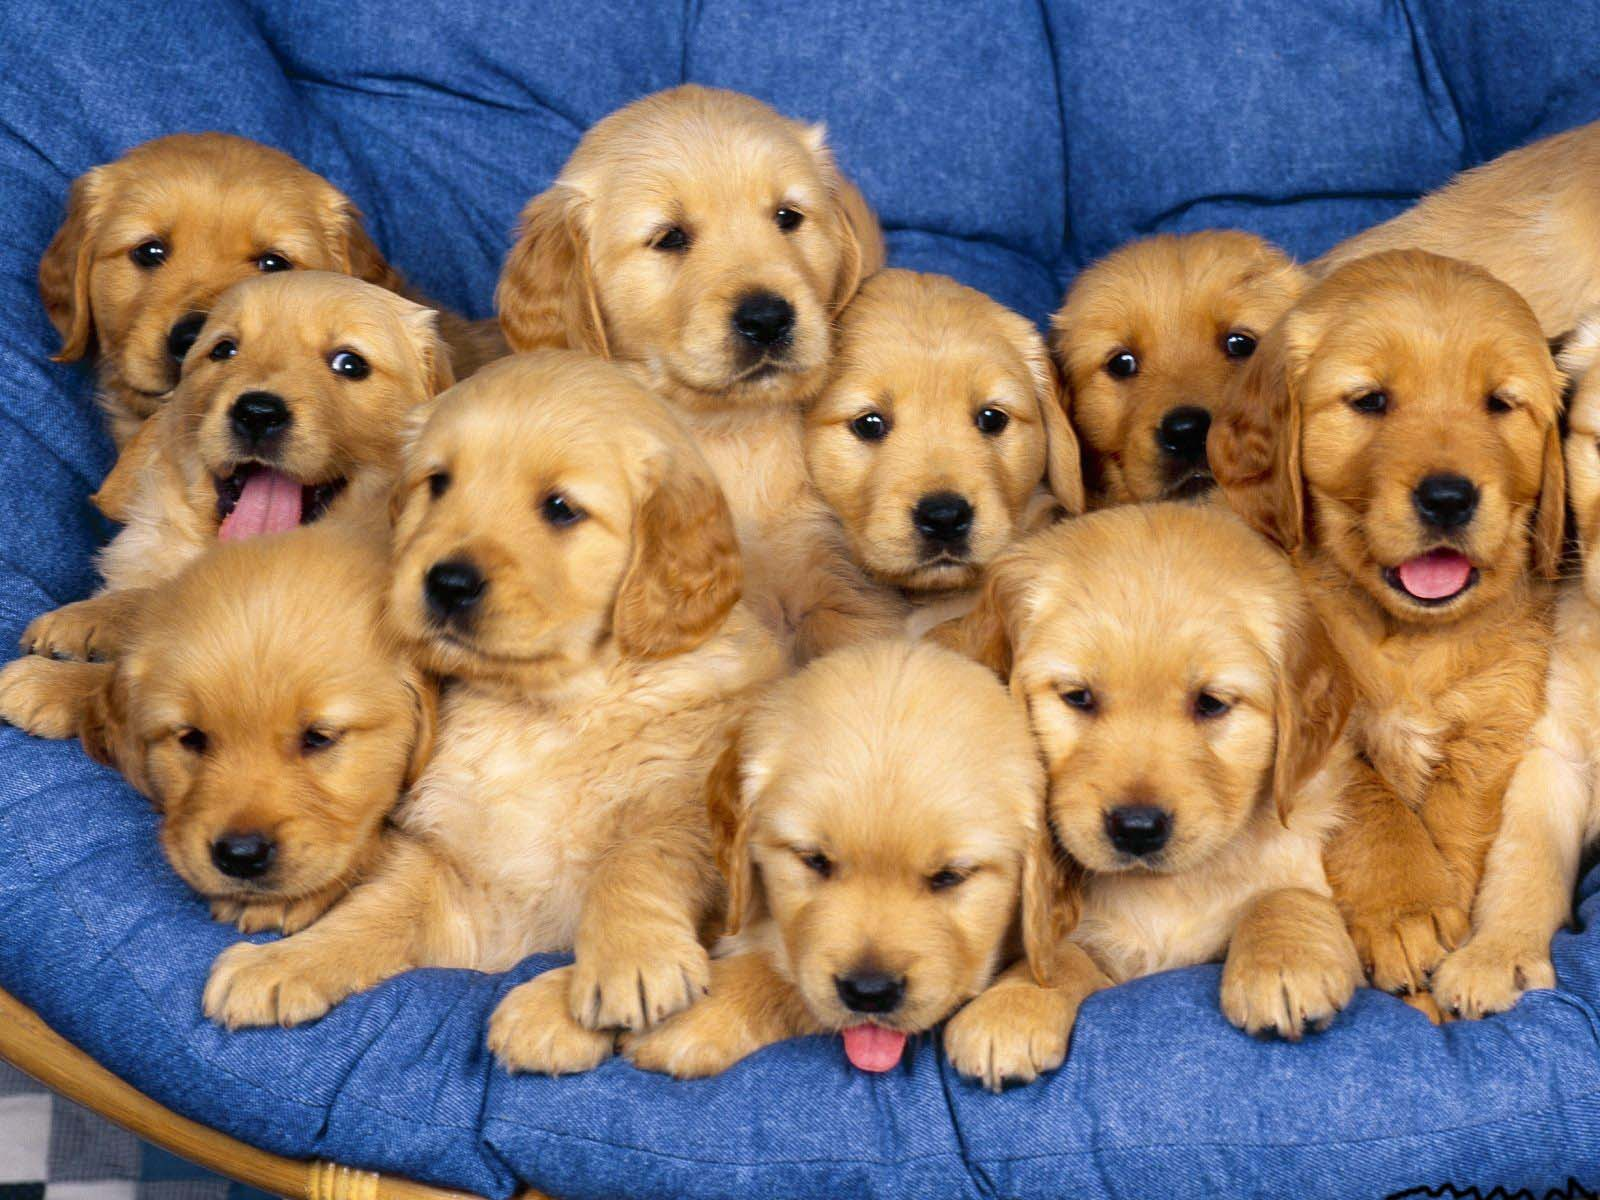 Nice puppy photo